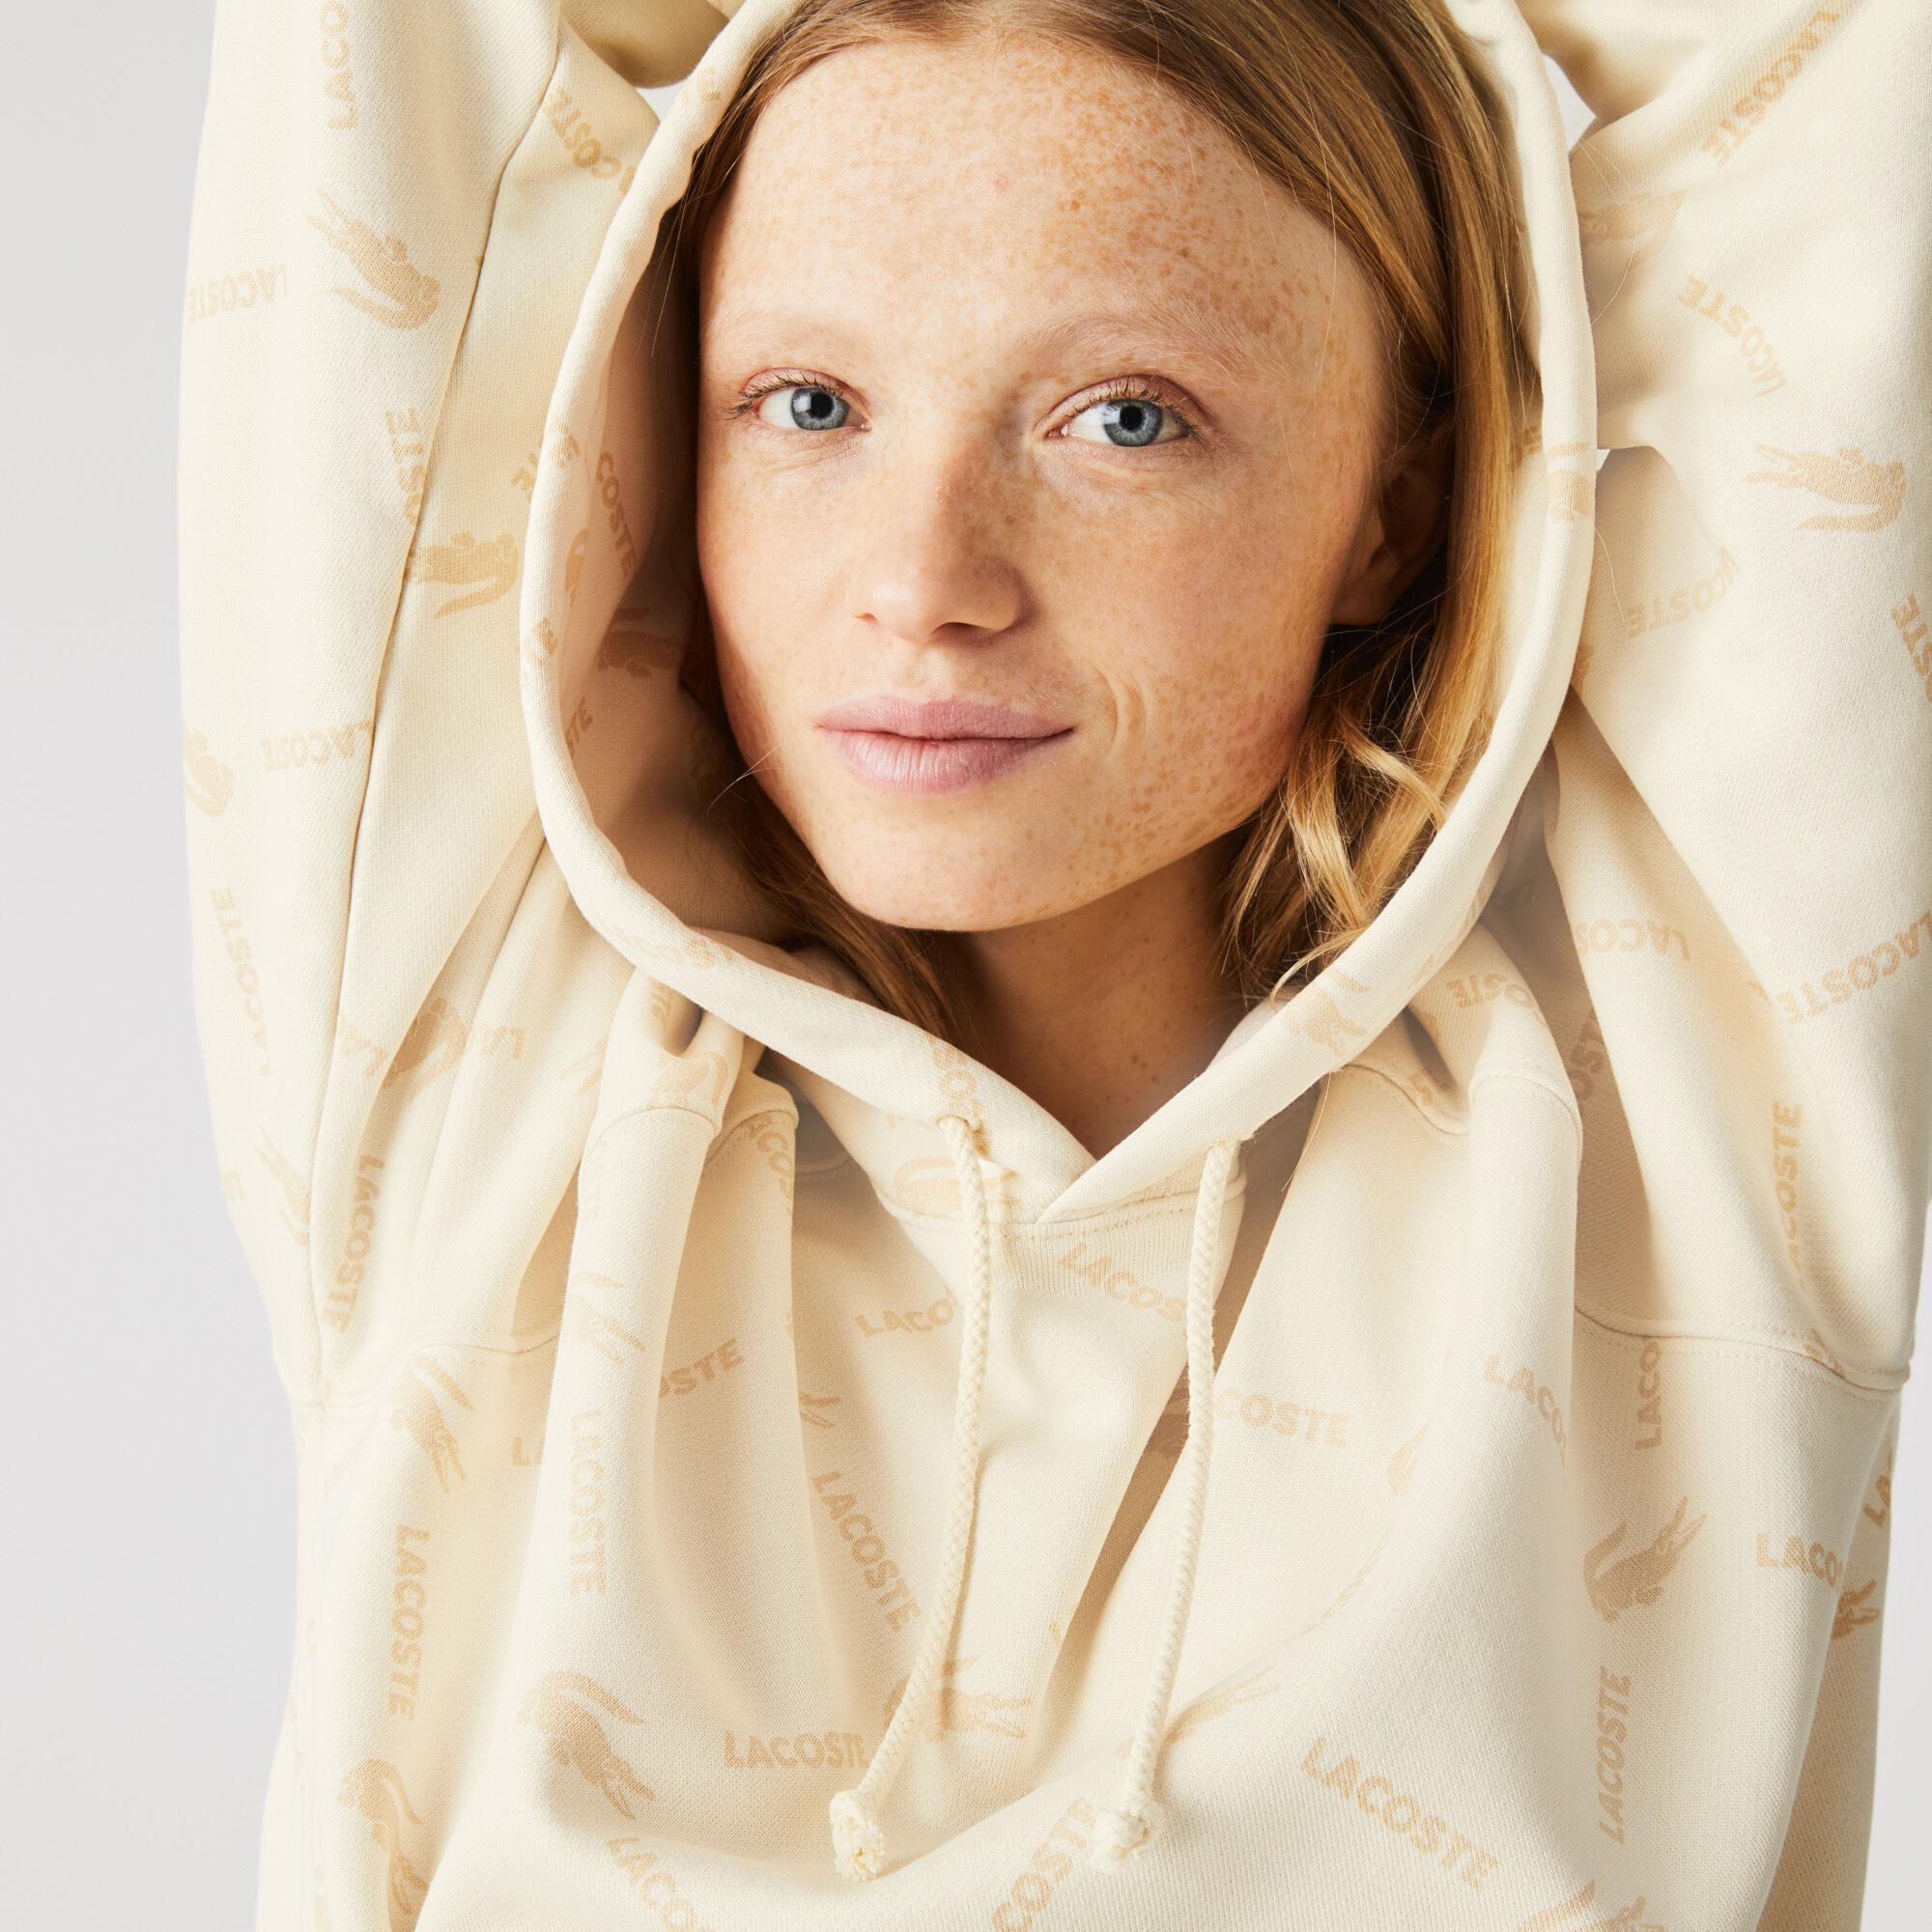 Unisex Lacoste LIVE Loose Fit Hooded Monogram Cotton Sweatshirt